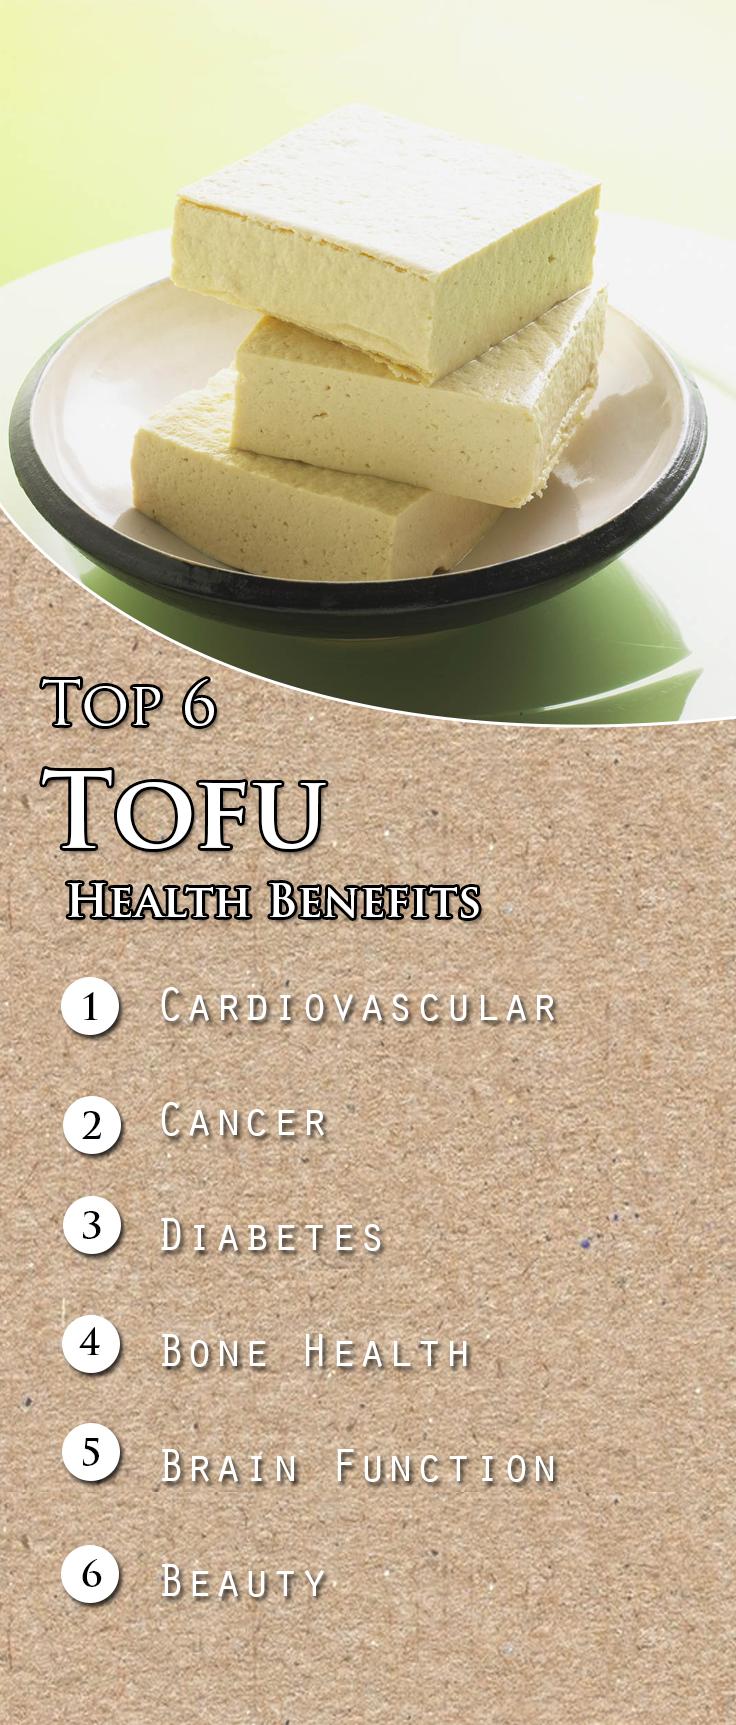 Tofu Nutrition Facts And Health Benefits Tofu Health Benefits Healthy Food Facts Vegetarian Facts